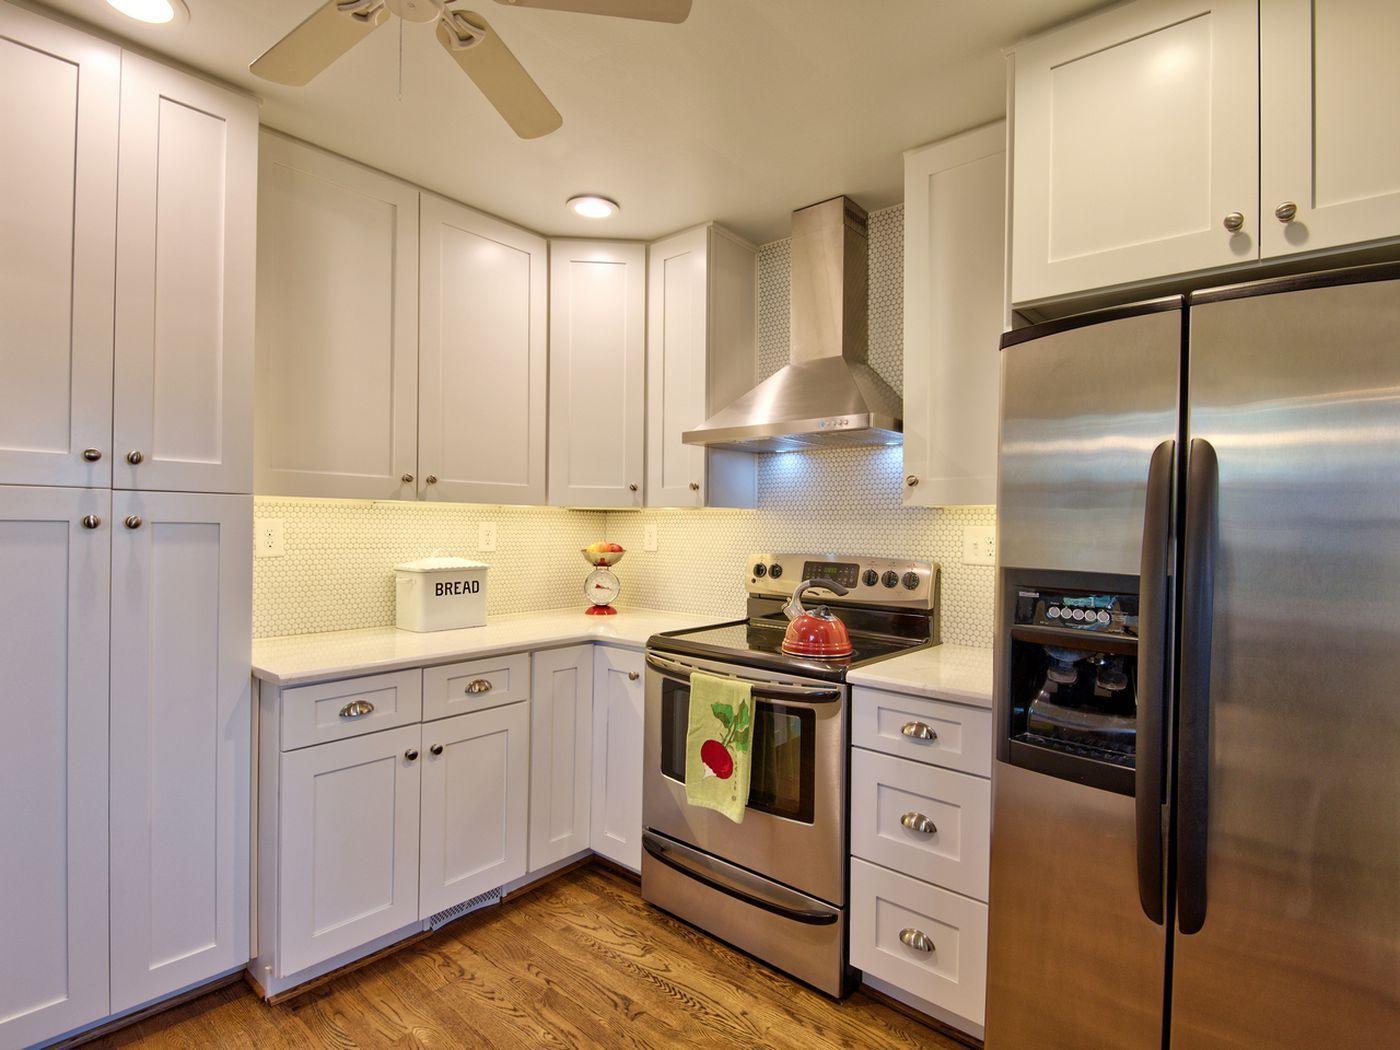 1908 Glendale Avenue Durham Nc 27701 Listreports Kitchen Countertops Kitchen Cabinets Kitchen